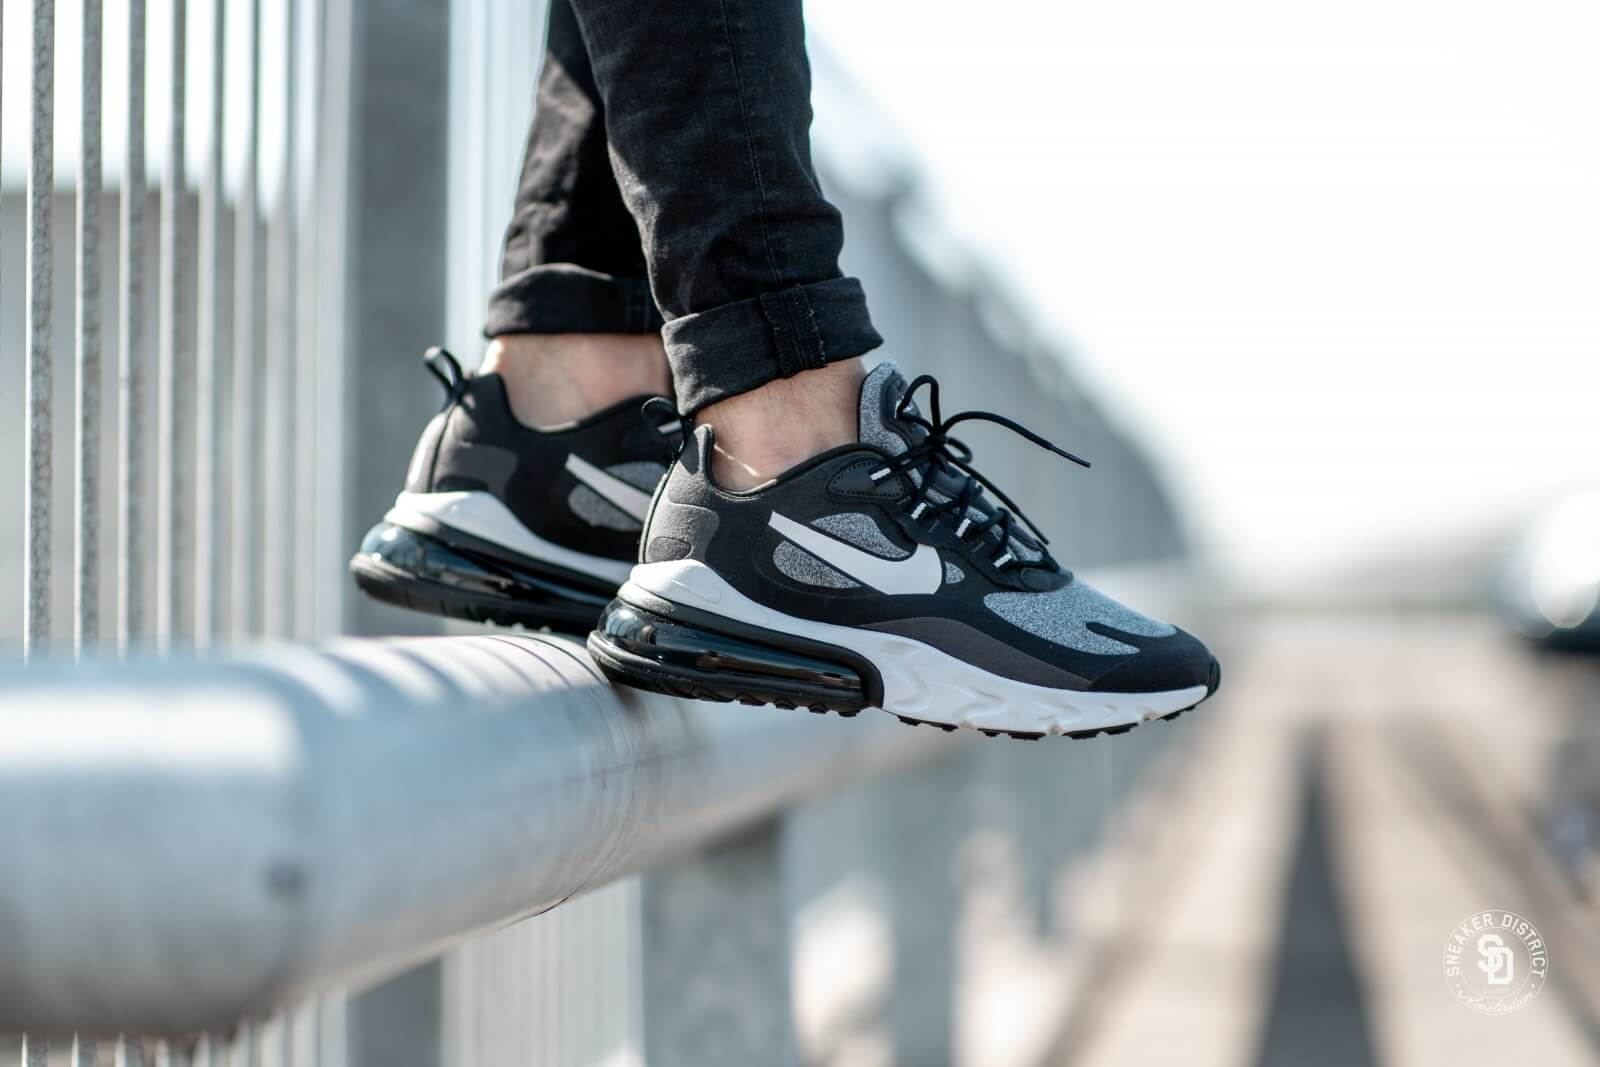 Nike Air Max 270 React BlackVast Grey Off Noir AO4971 001